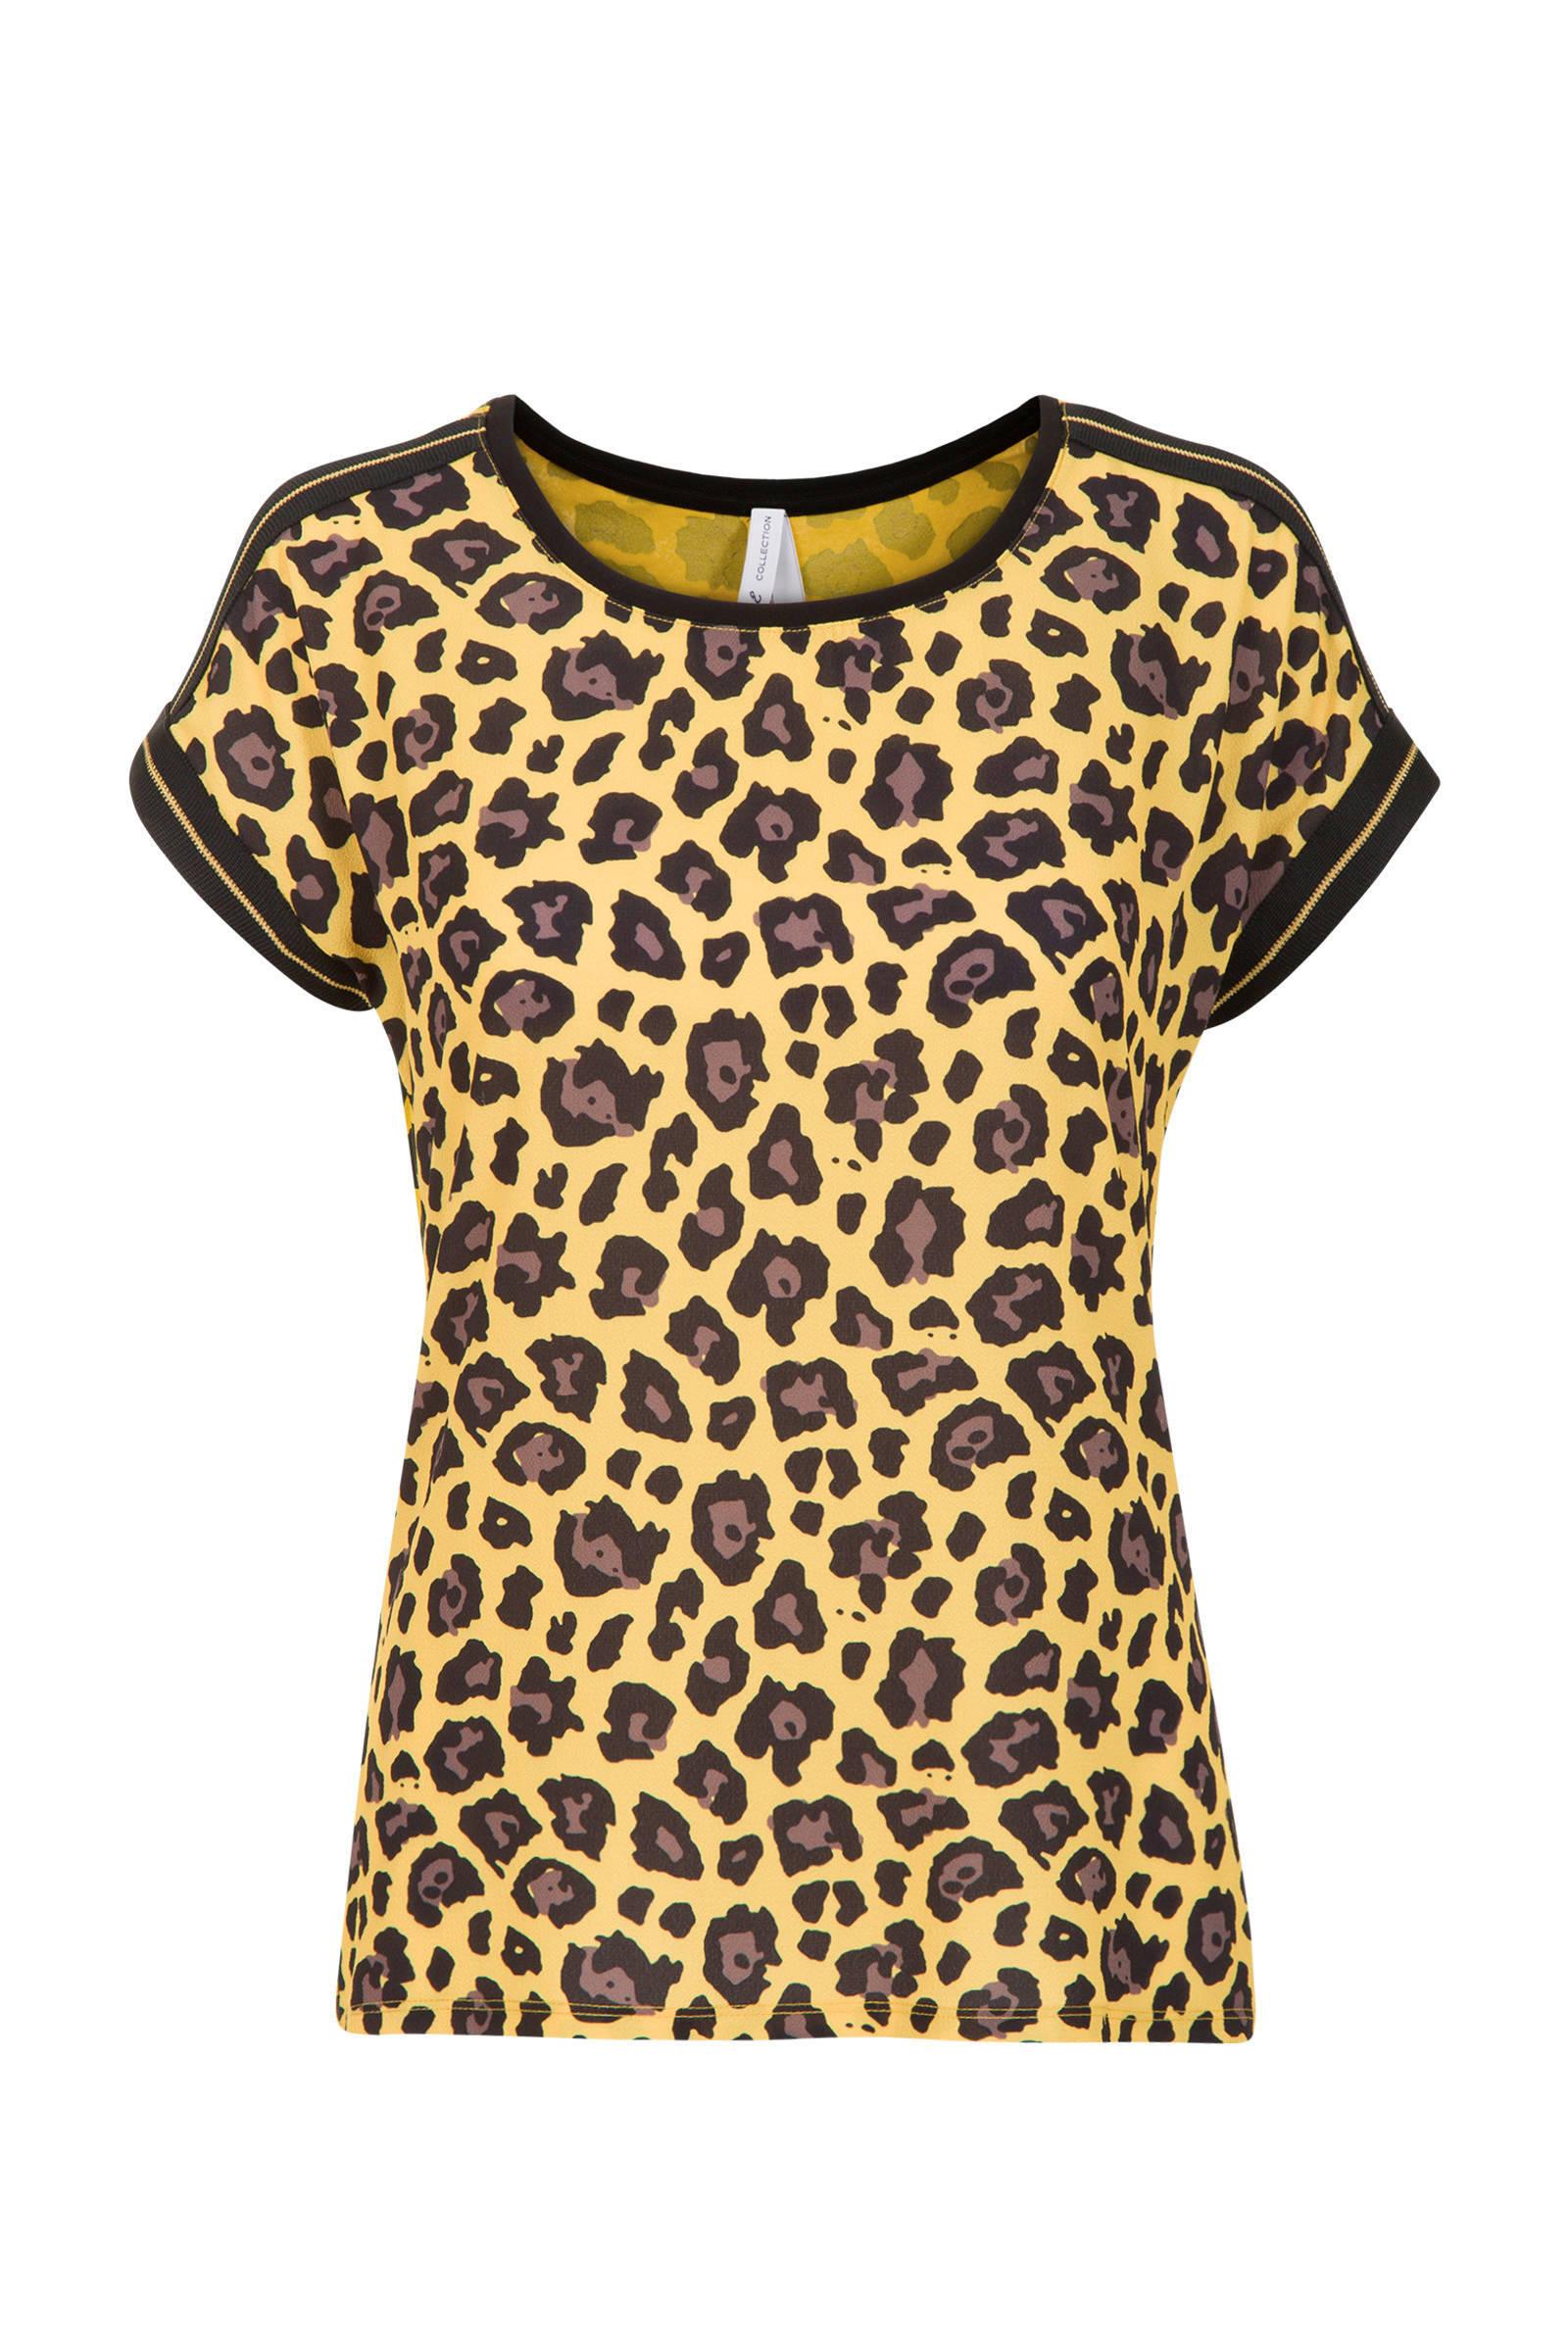 7ccb5a333541c2 T Bezorging Tops Gratis Bij Dames Shirtsamp  Wehkamp Vanaf 20 WEIbH92eDY